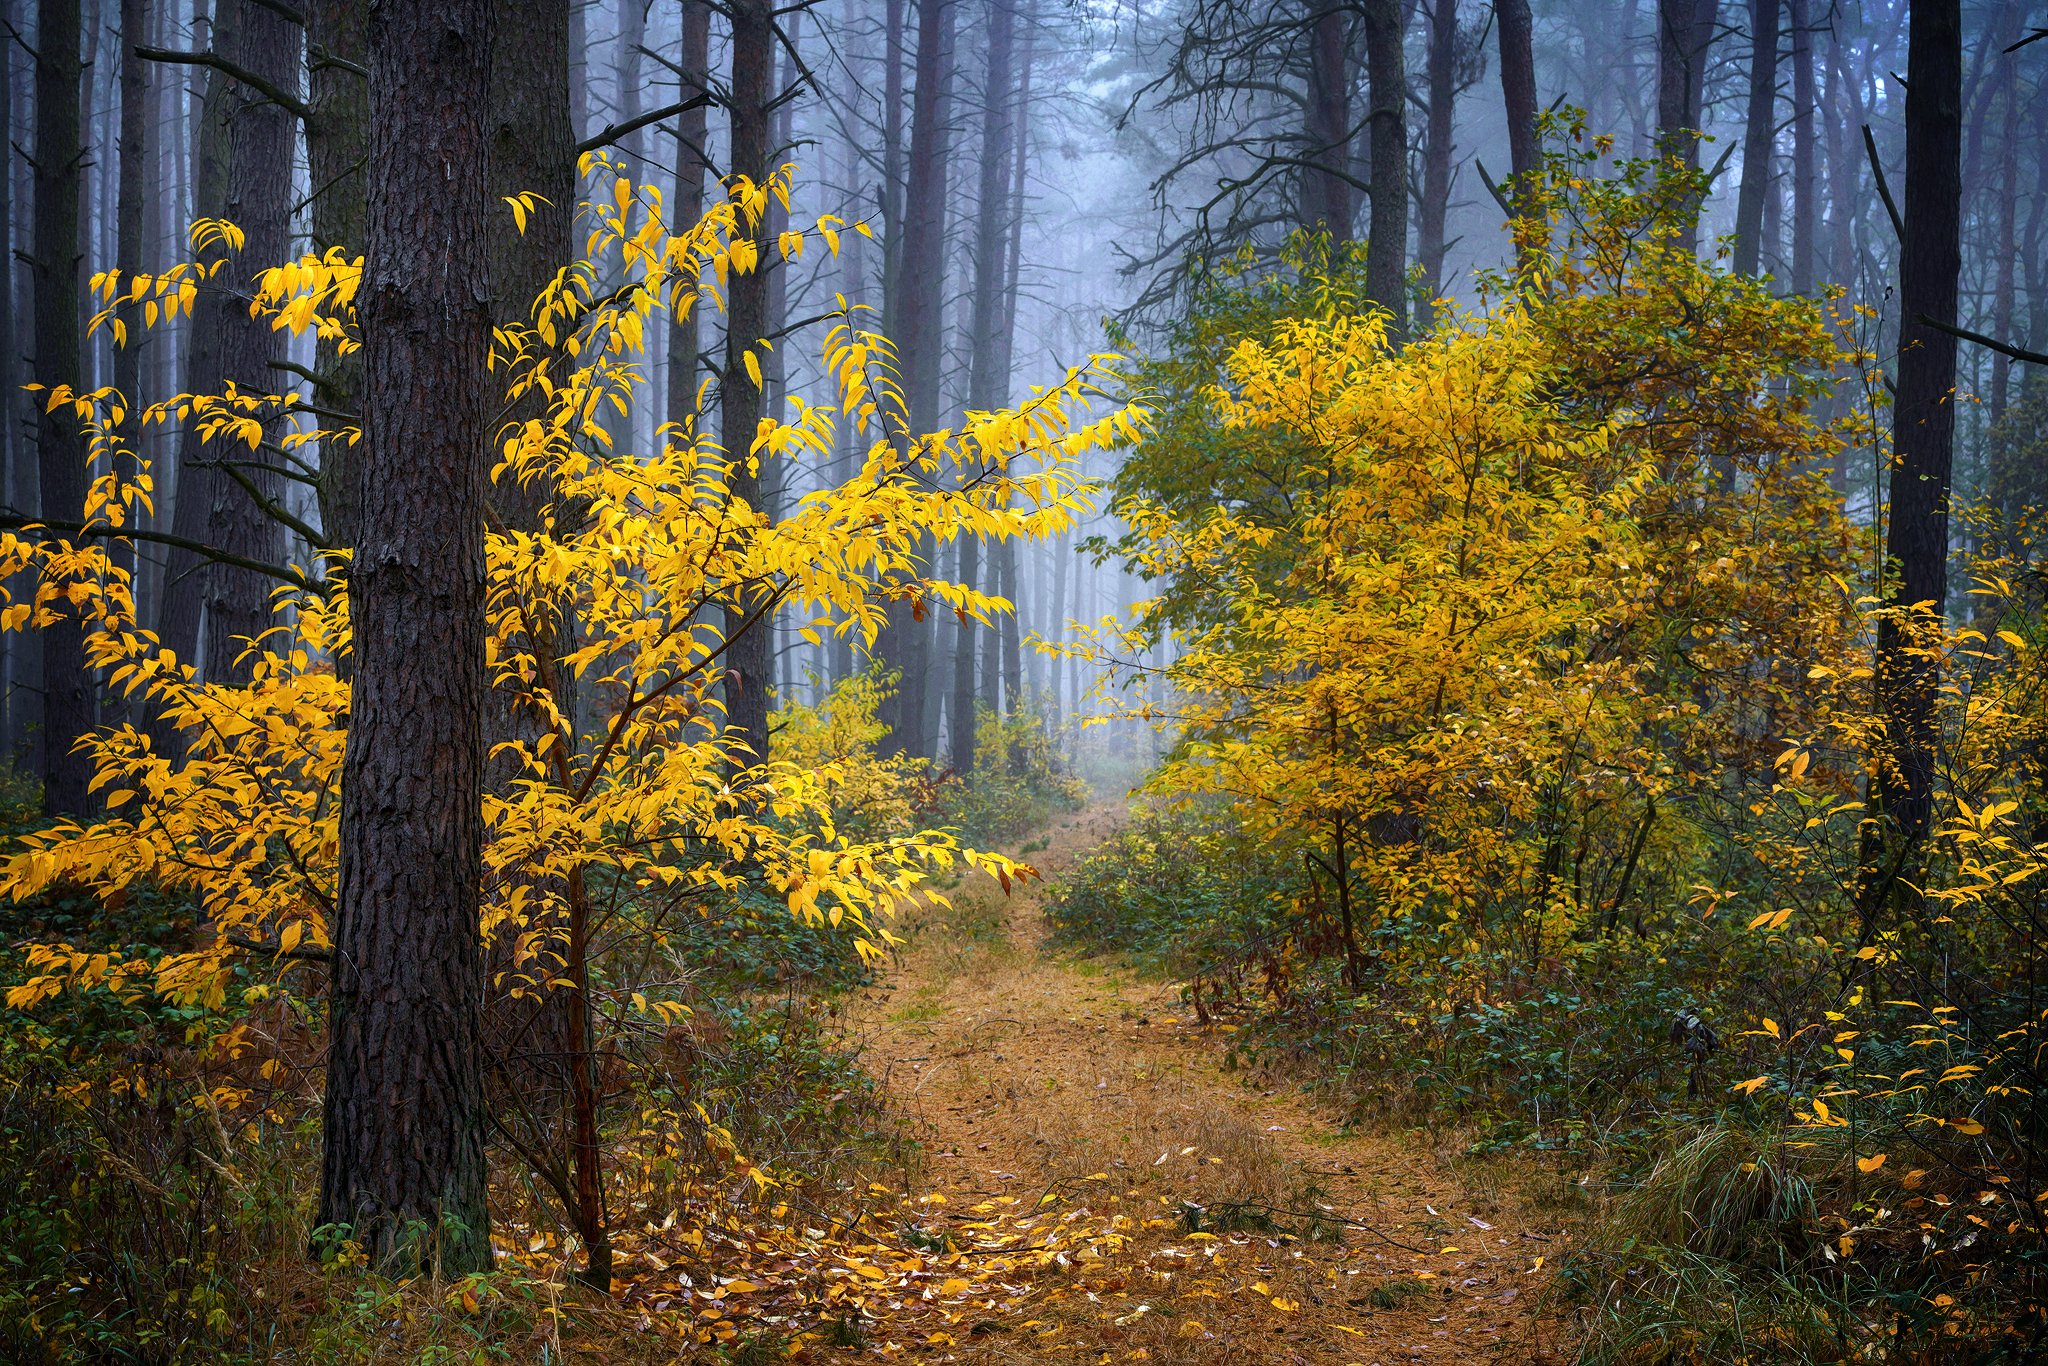 осенняя прогулка по лесу autumn fall wood dranikowski path road forest trees magic foggy, Radoslaw Dranikowski